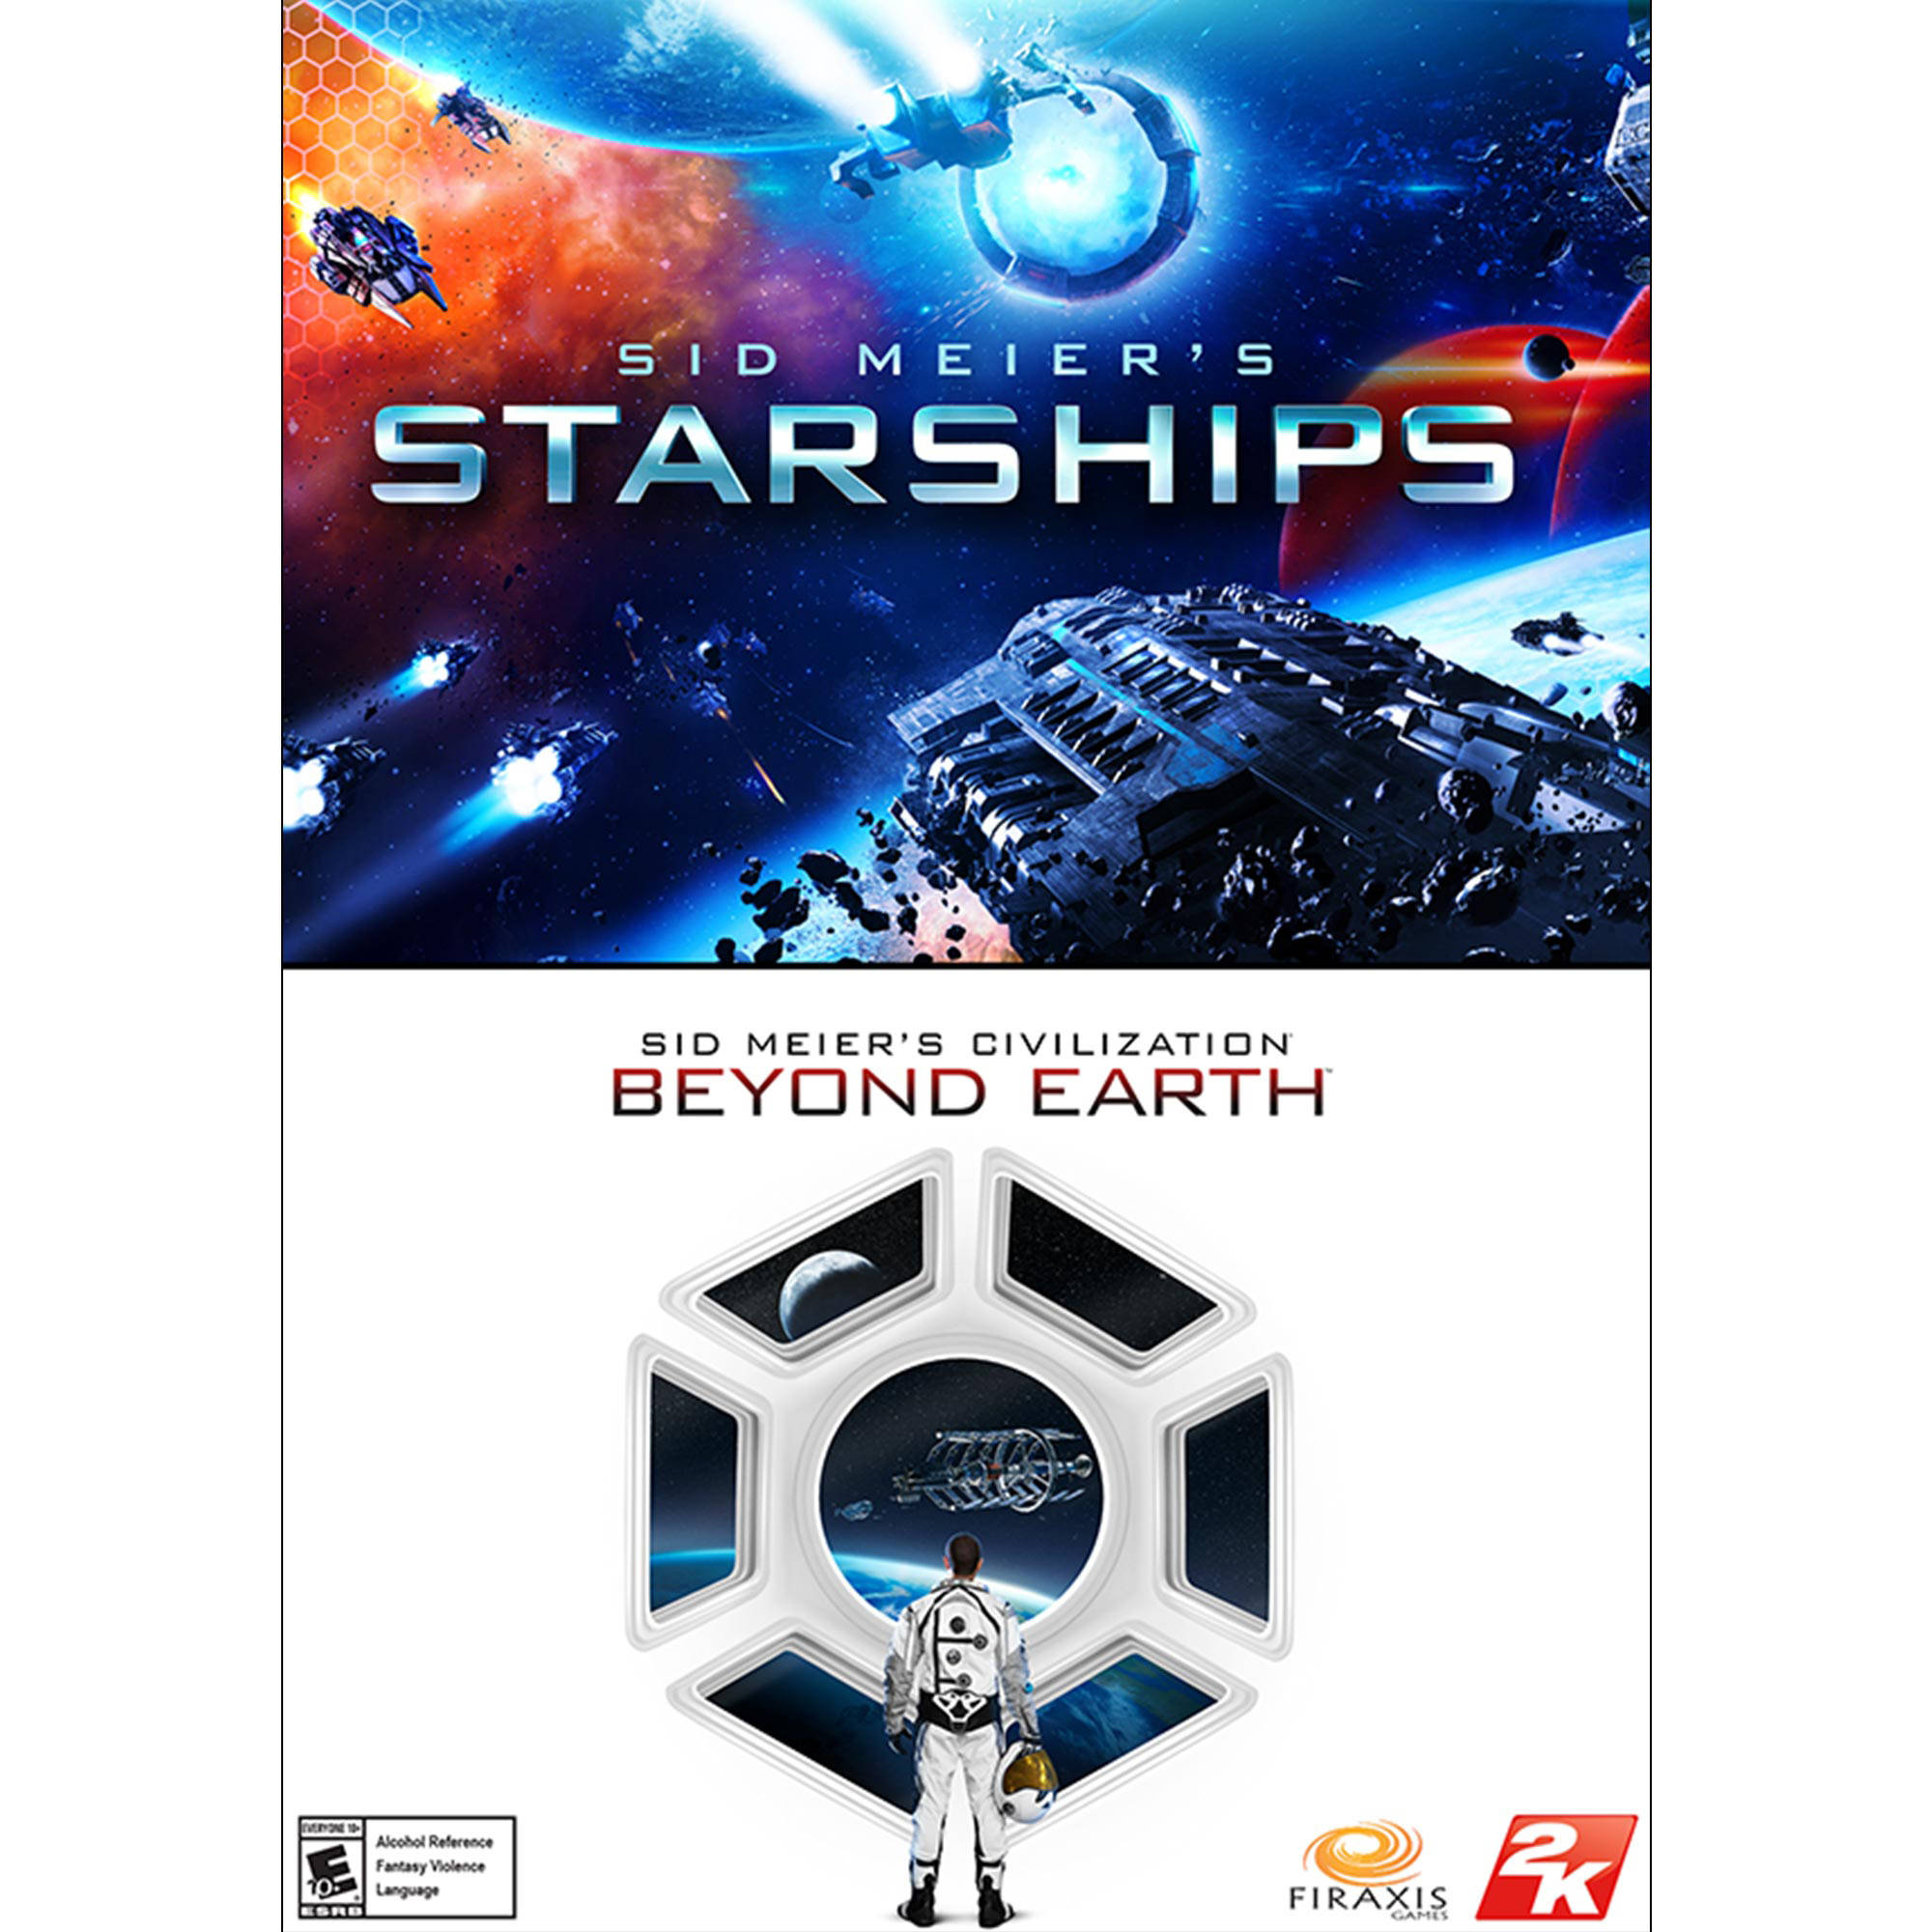 Sid Meier's Starships and Sid Meier's Civilization: Beyond Earth Bundle (PC) (Digital Download)